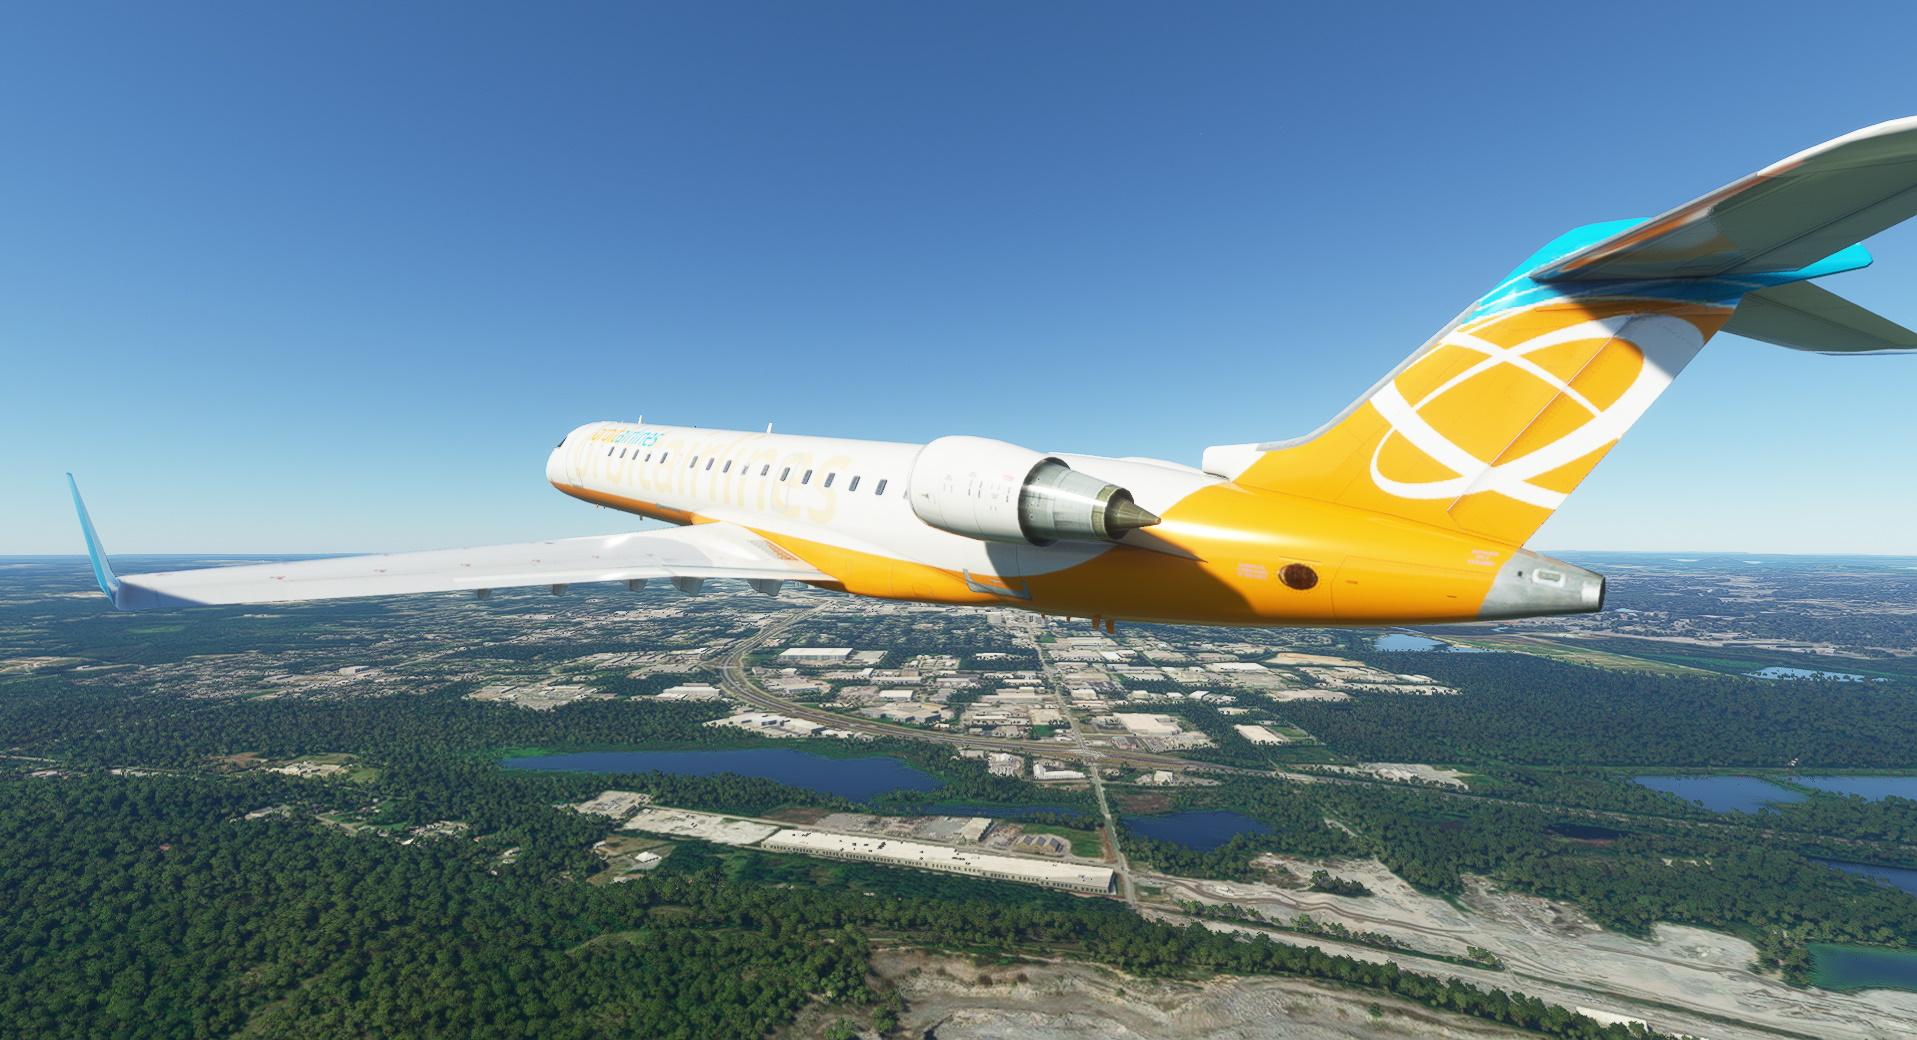 Microsoft Flight Simulator Bombardier Crjj 700 Fsx Mod